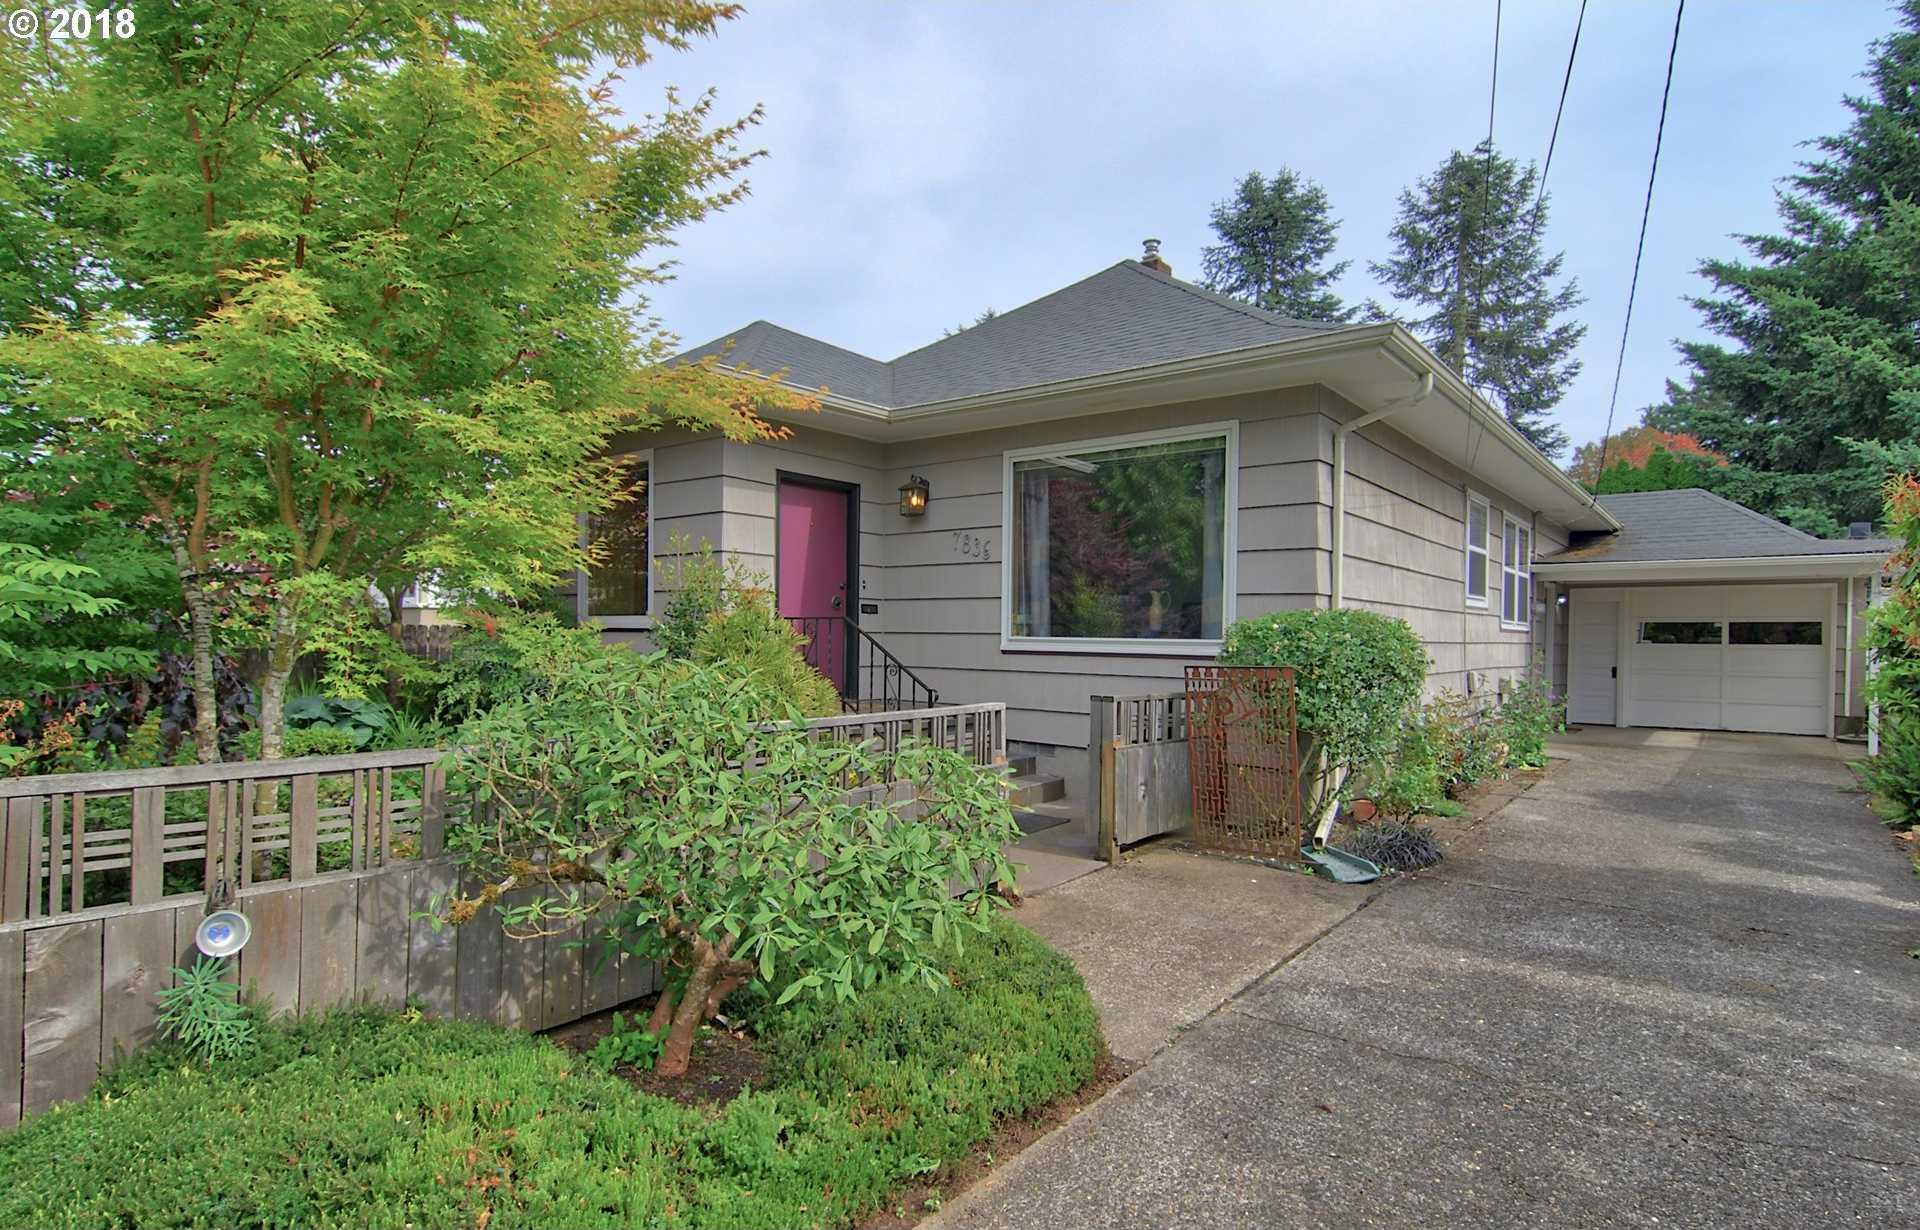 $500,000 - 3Br/2Ba -  for Sale in East Tabor/montavilla, Portland